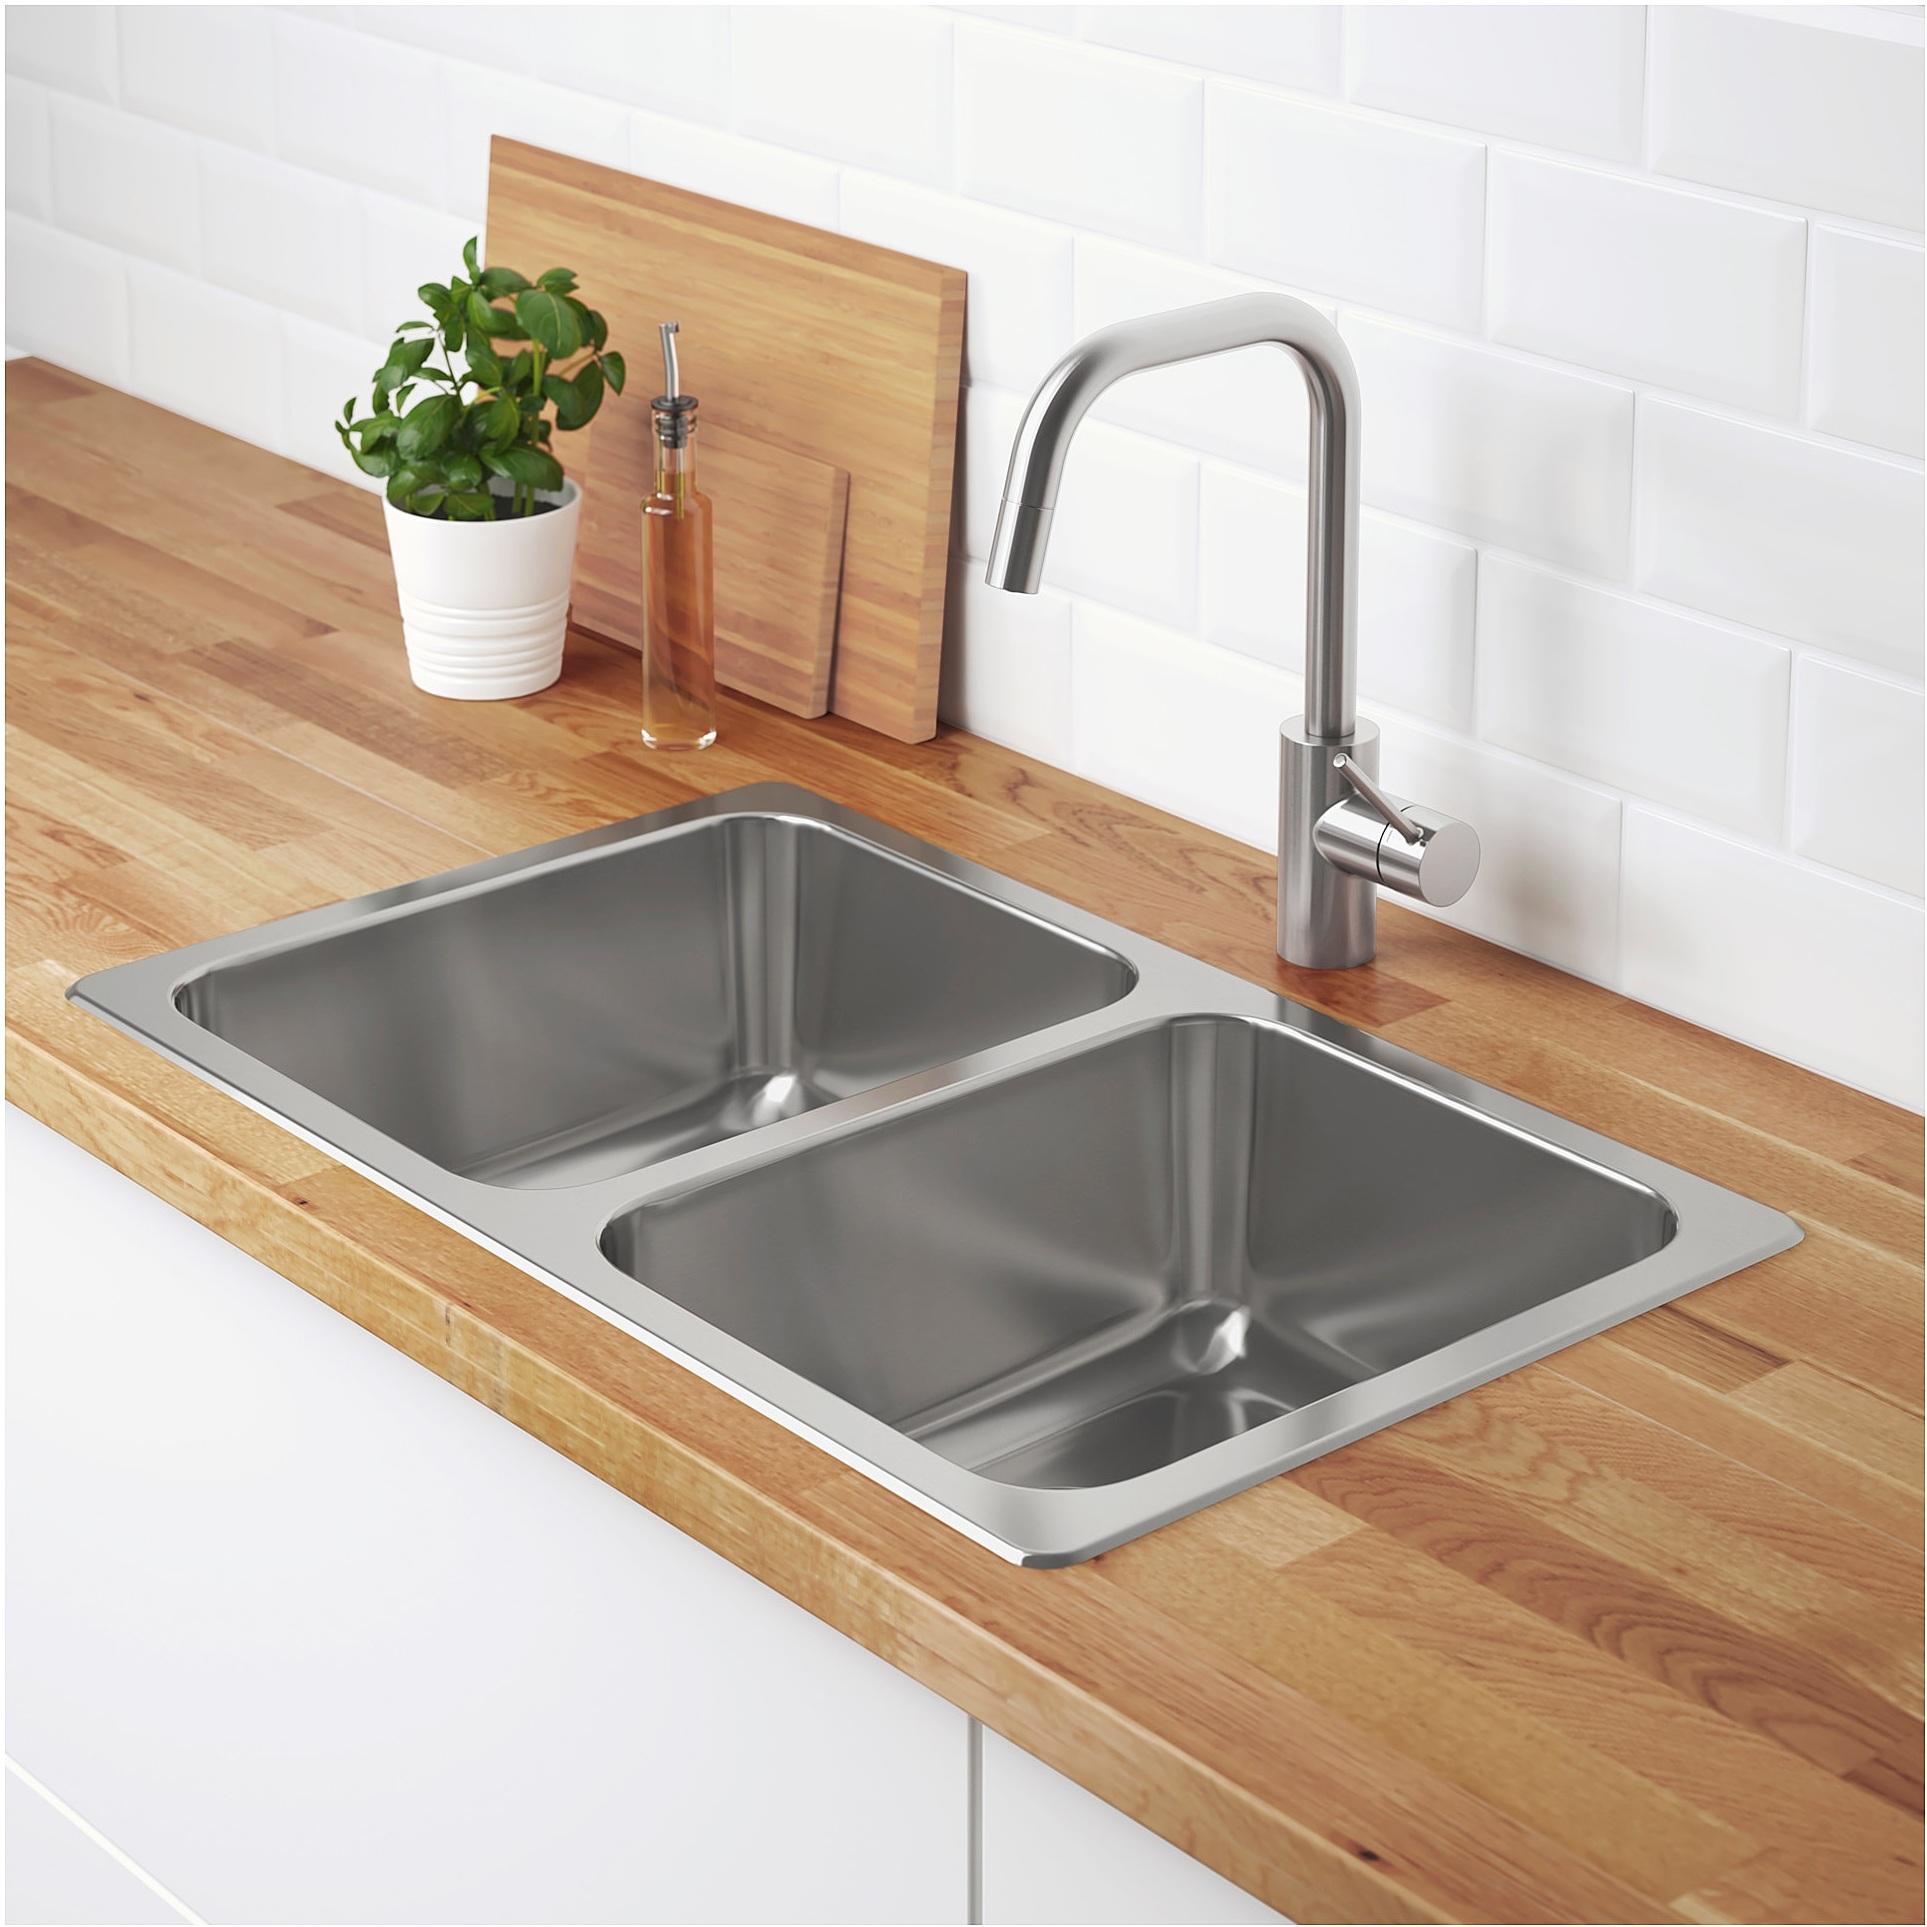 top mount or undermount sinks